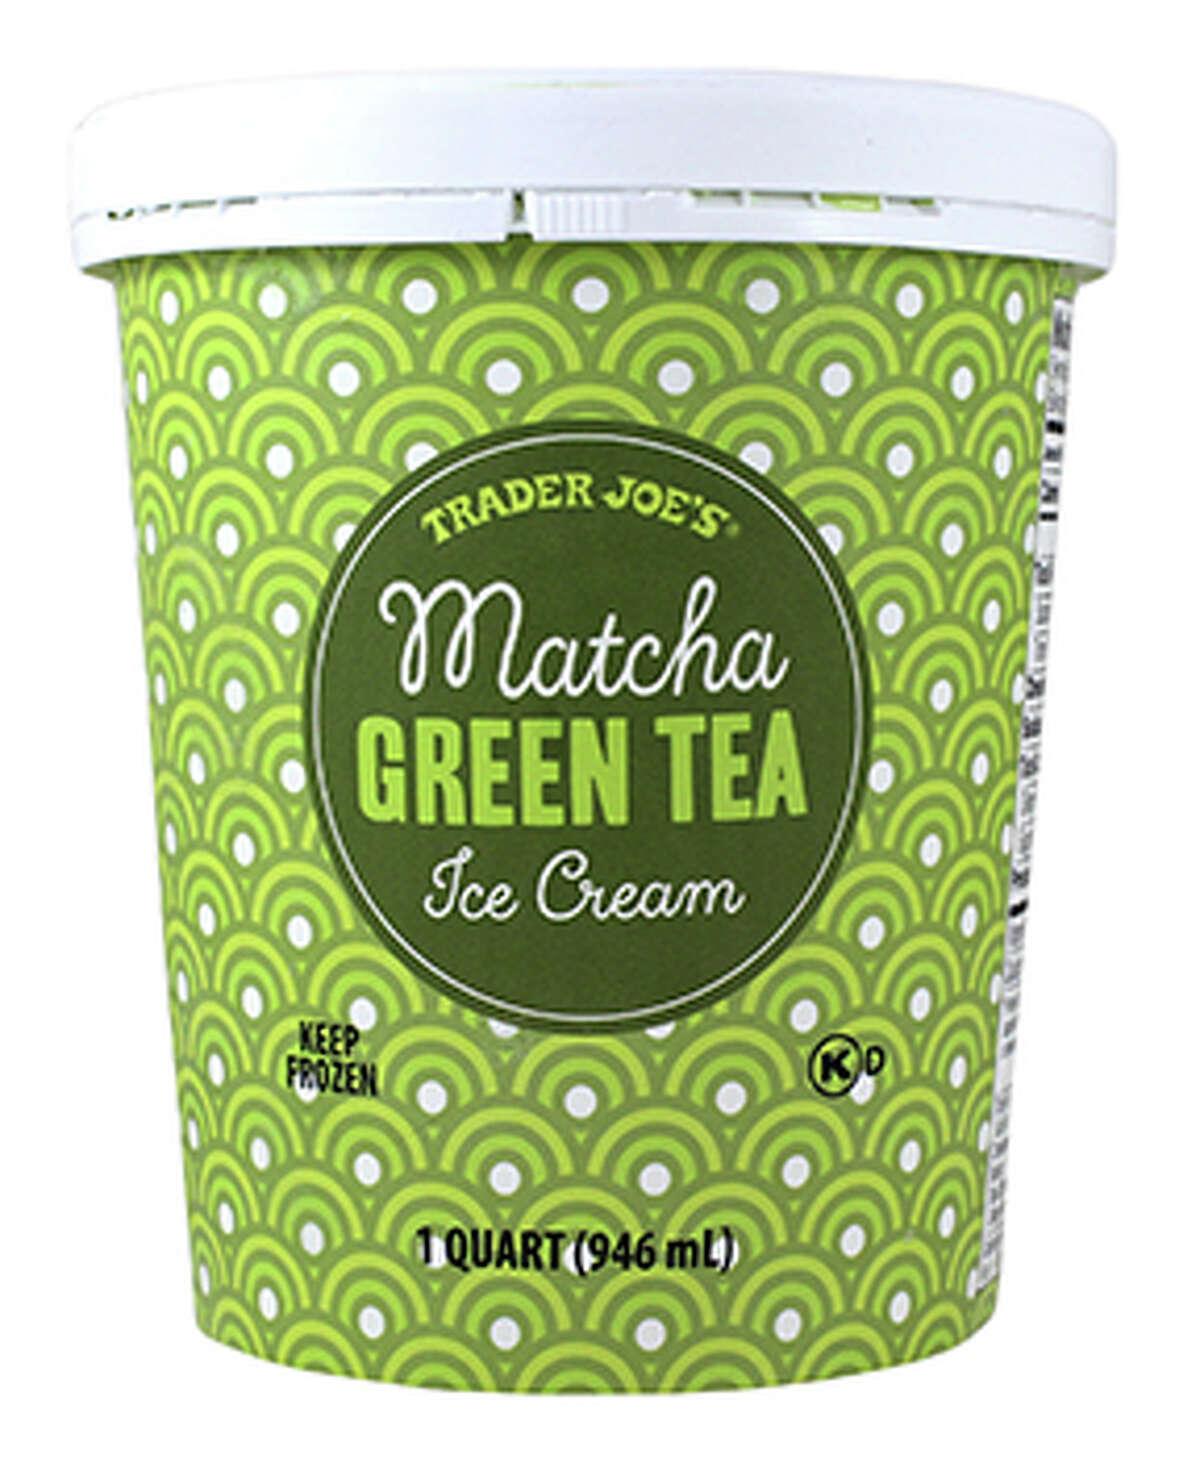 Trader Joe's is recalling cartons of its Matcha Green Tea ice cream.